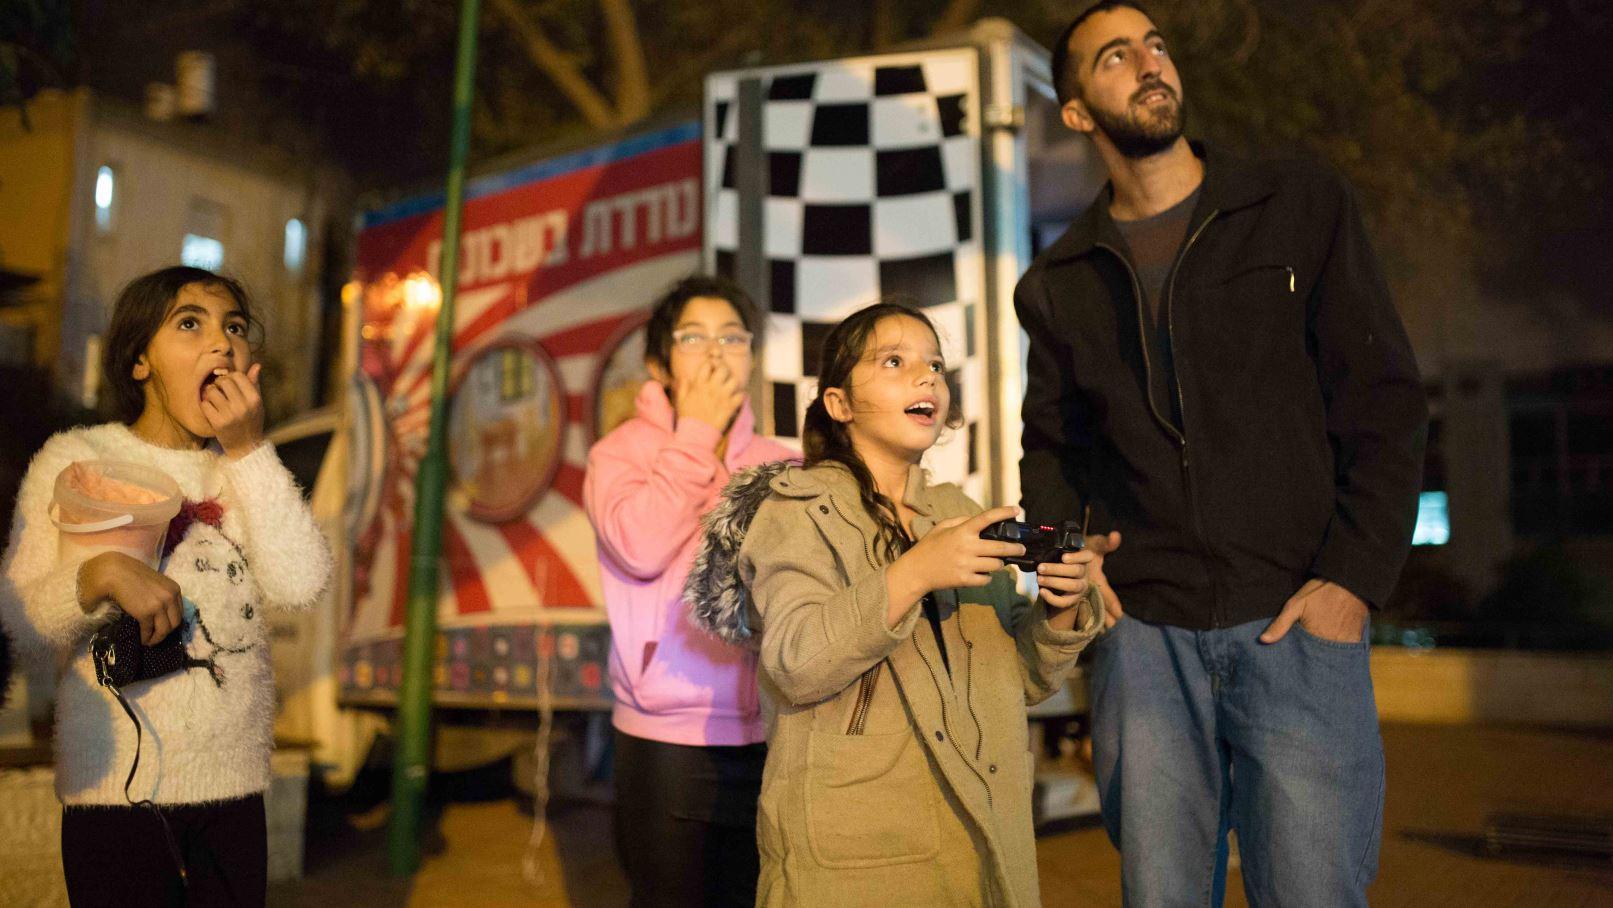 Residents enjoying a Zaza pop-up event in Jerusalem. Photo by Maxim Dinshtein